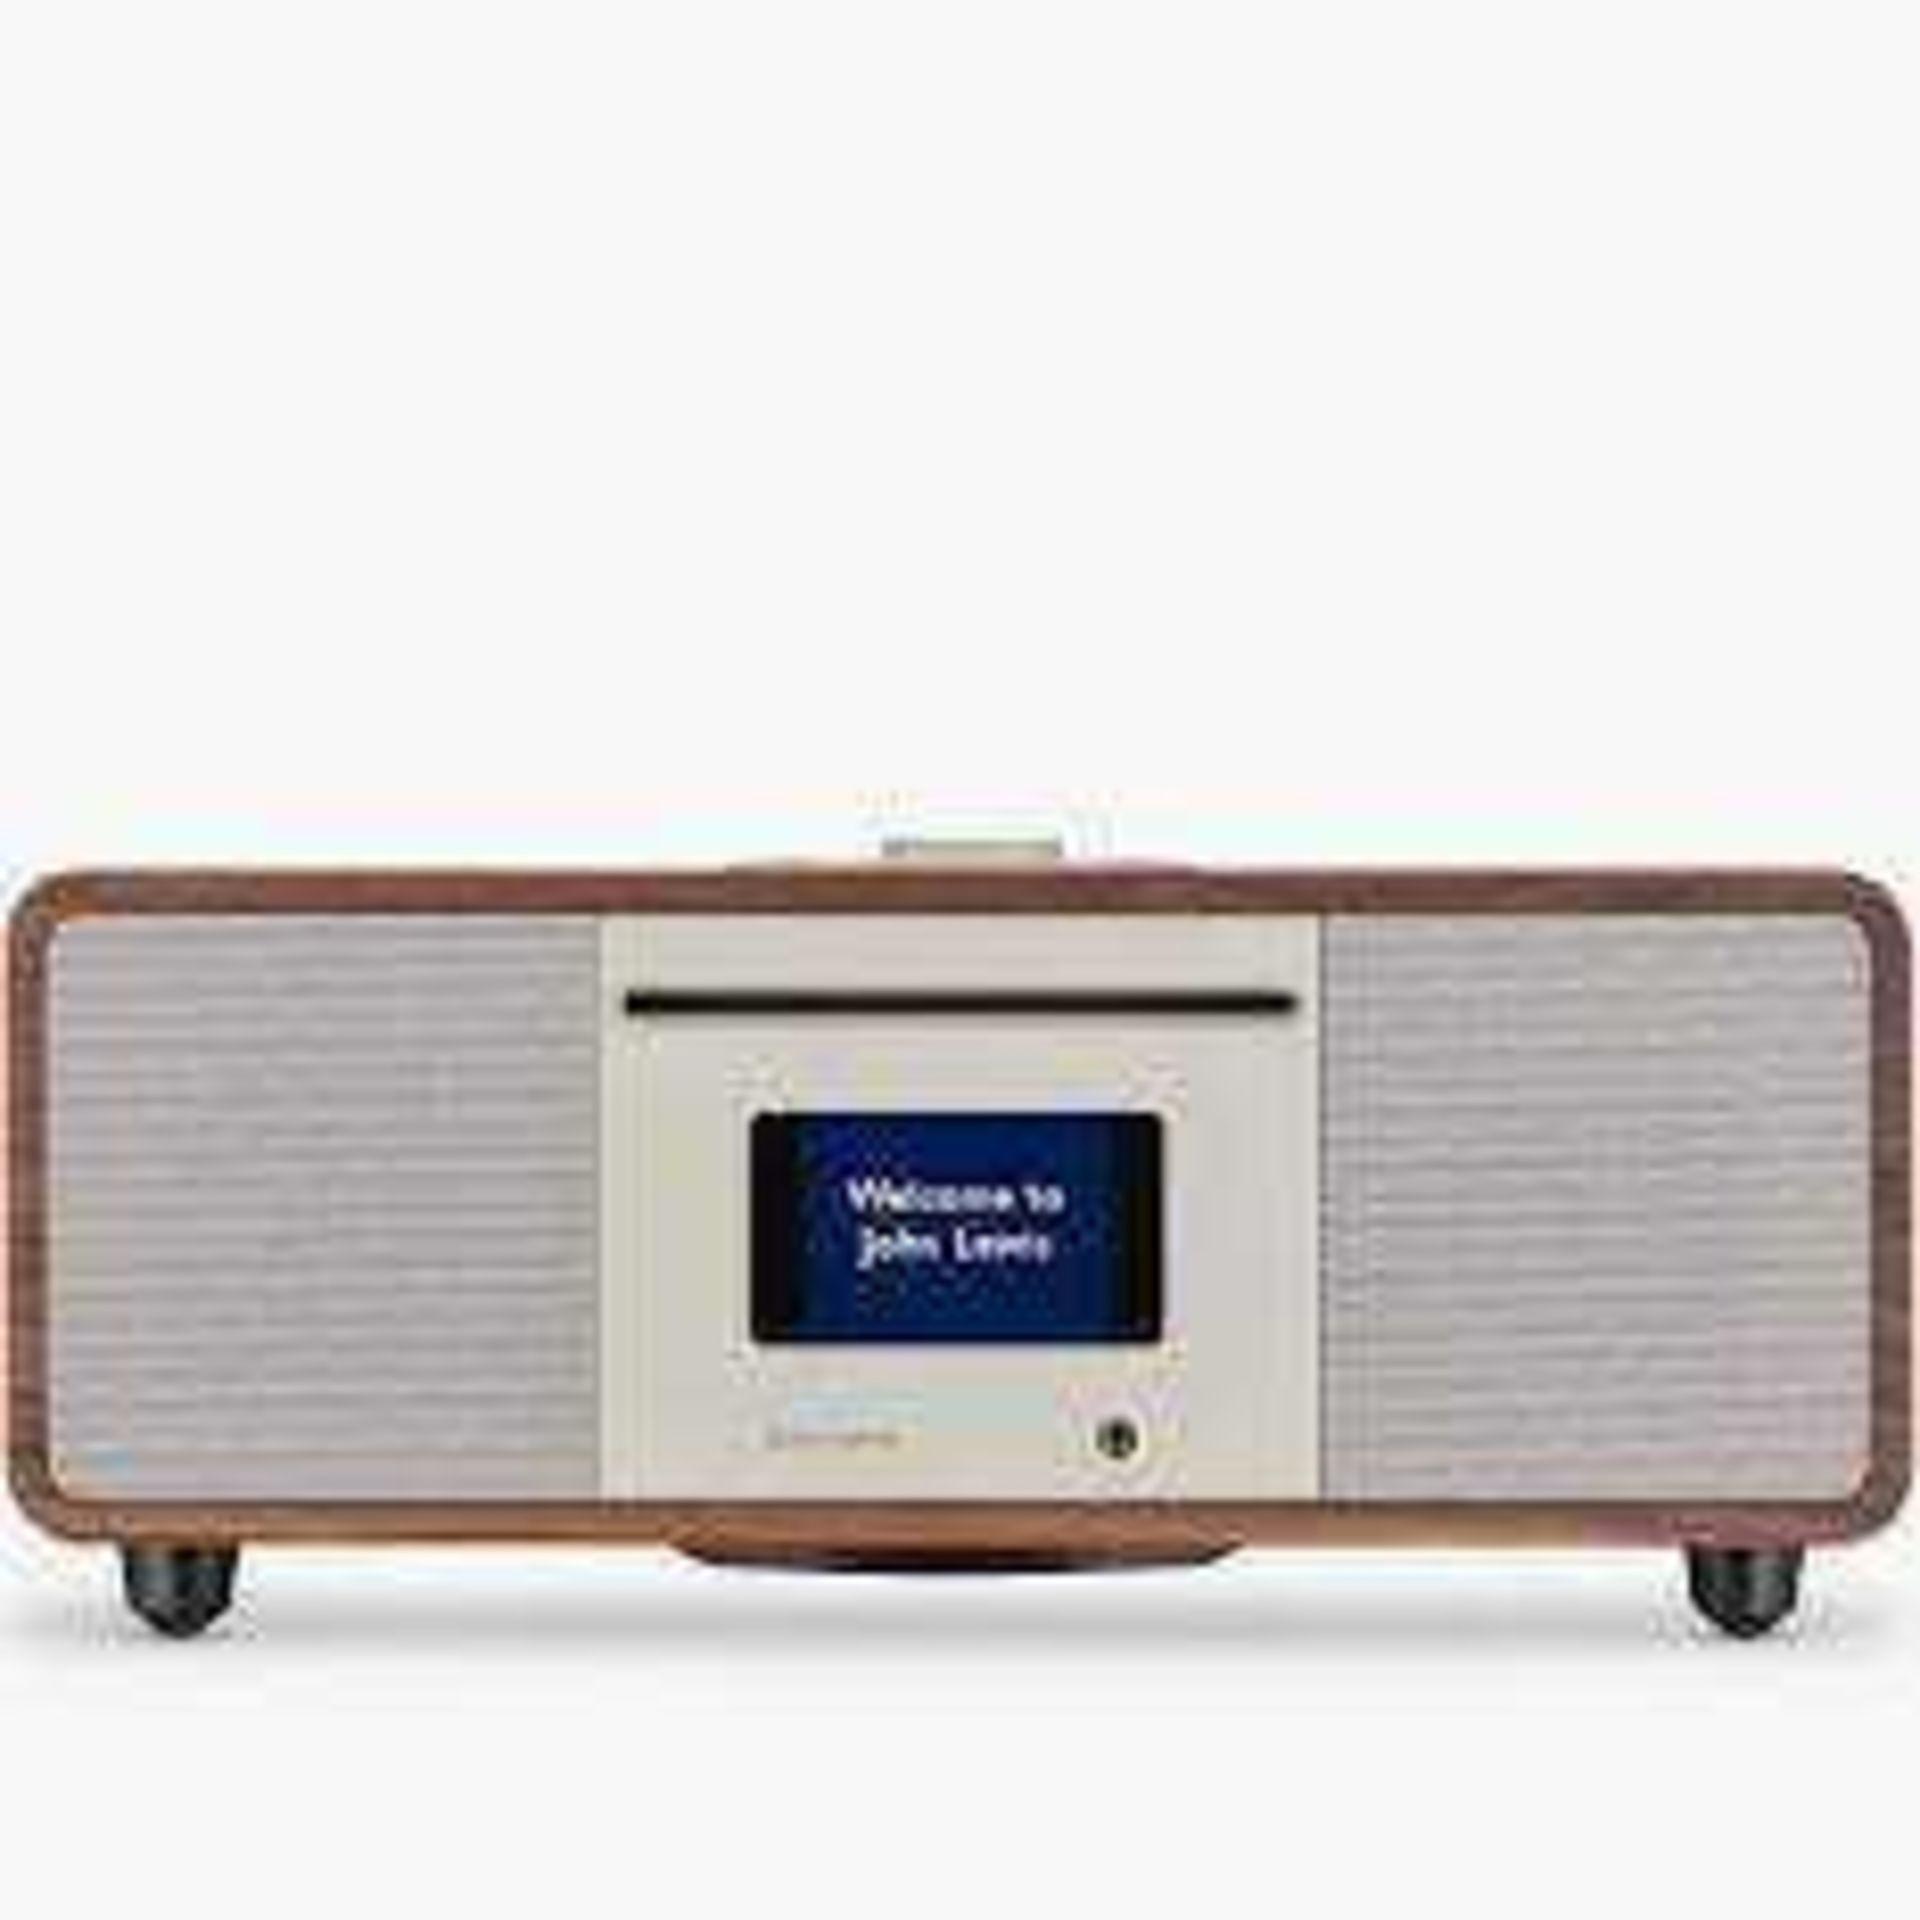 RRP £200 Boxed John Lewis Cello Hi-Fi Music System With Dab Fm Internet Radio